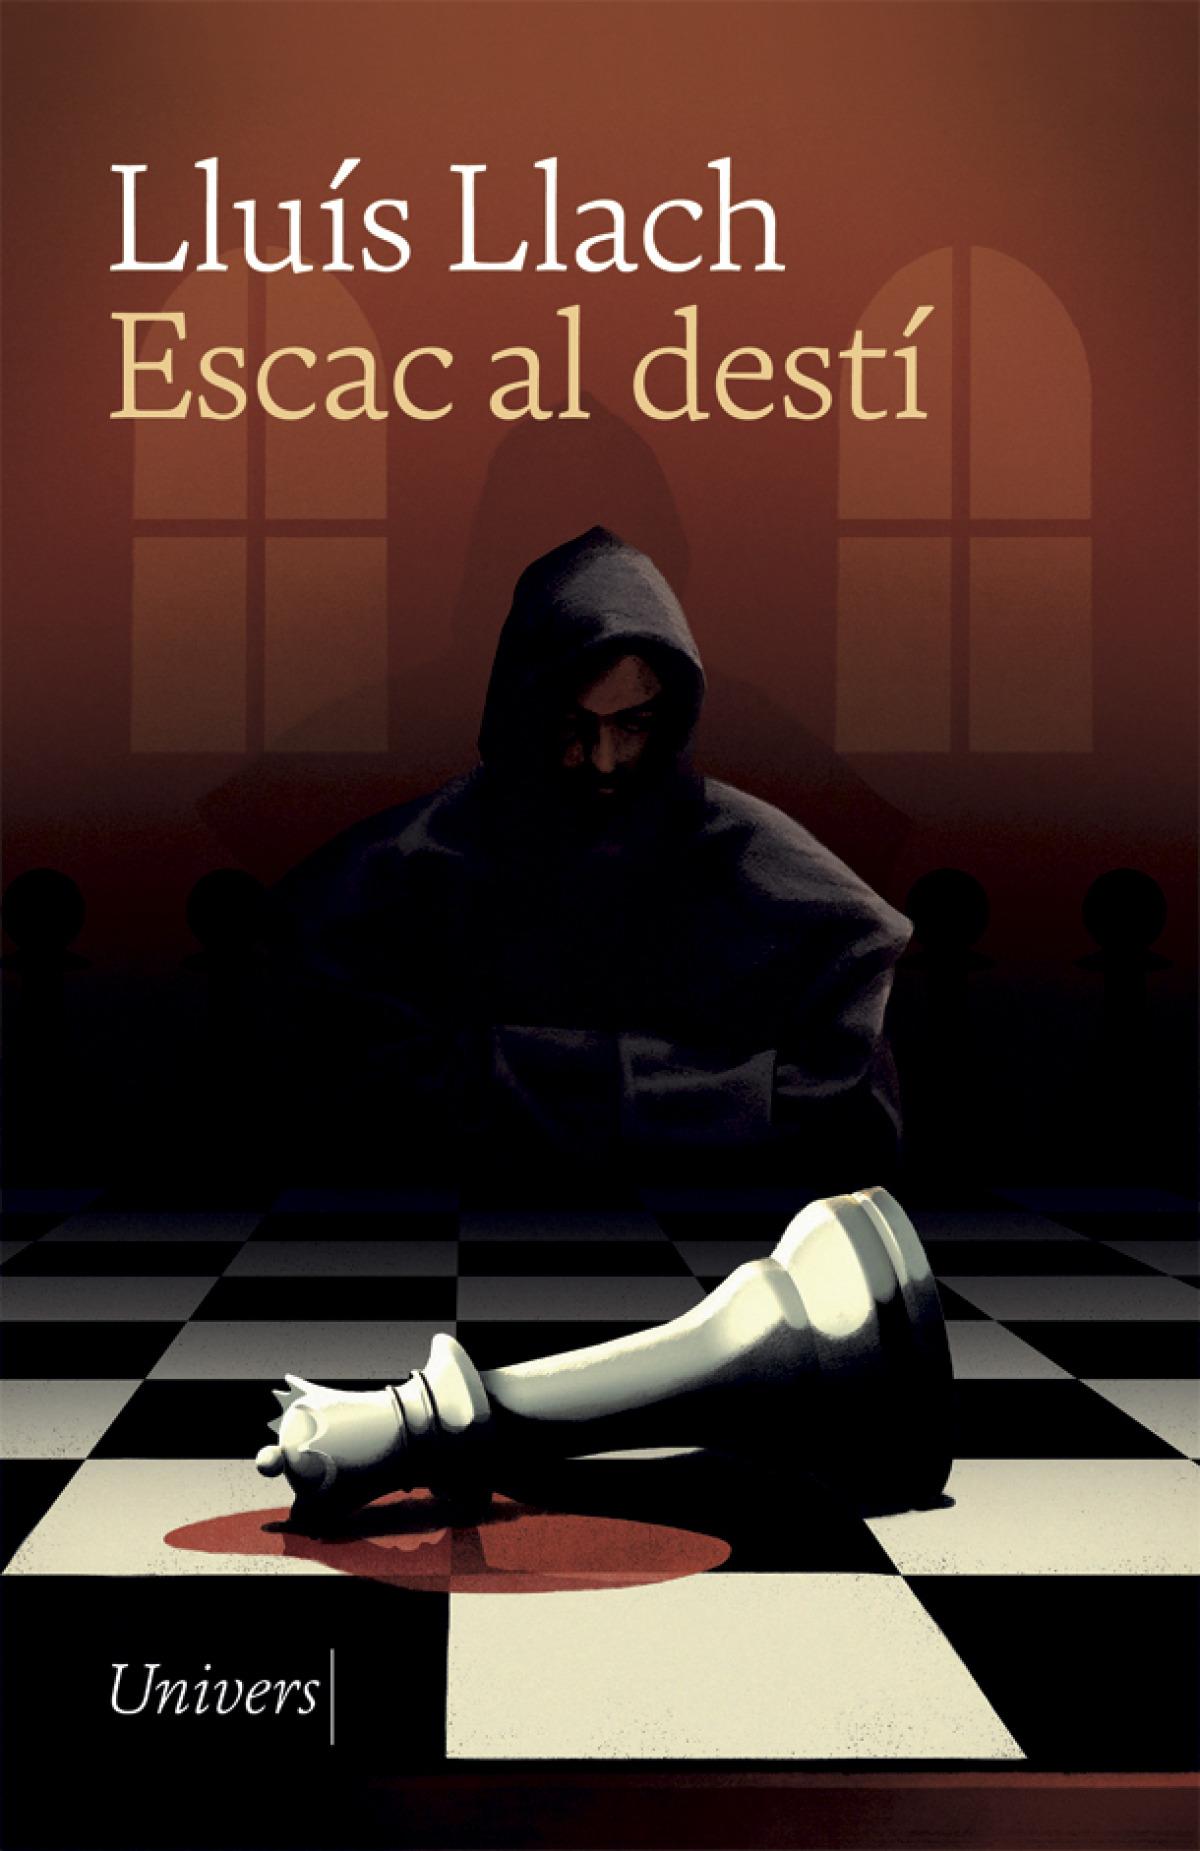 Escac al destí